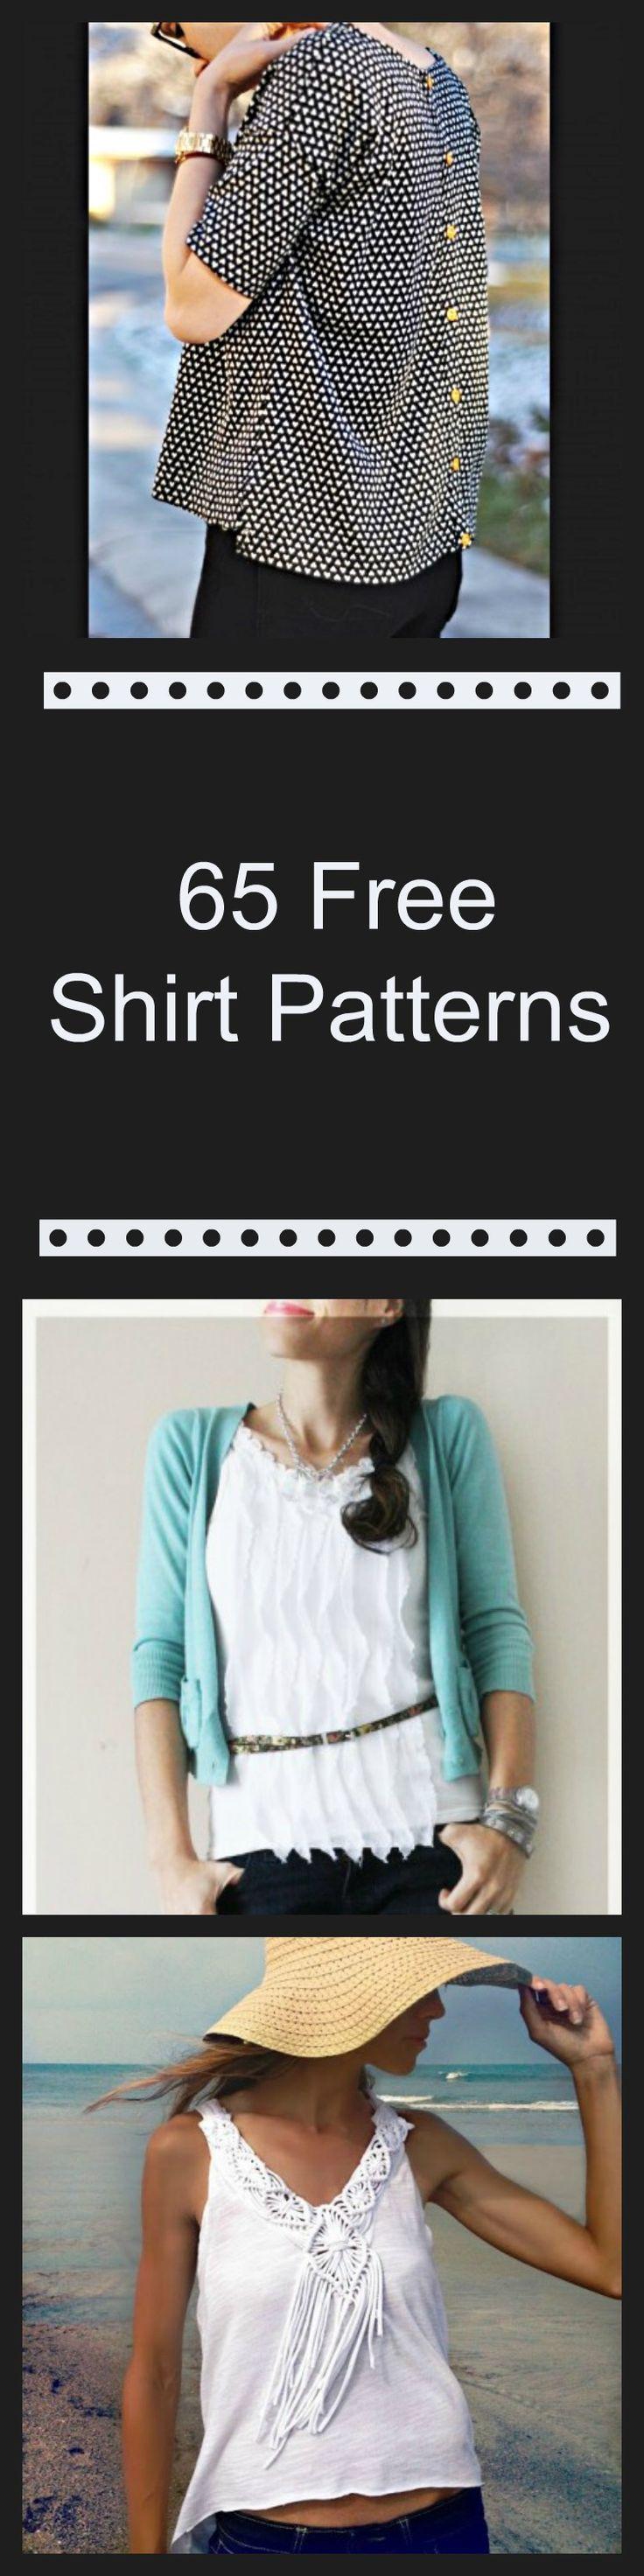 65 Free Shirt Patterns                                                                                                                                                     Más